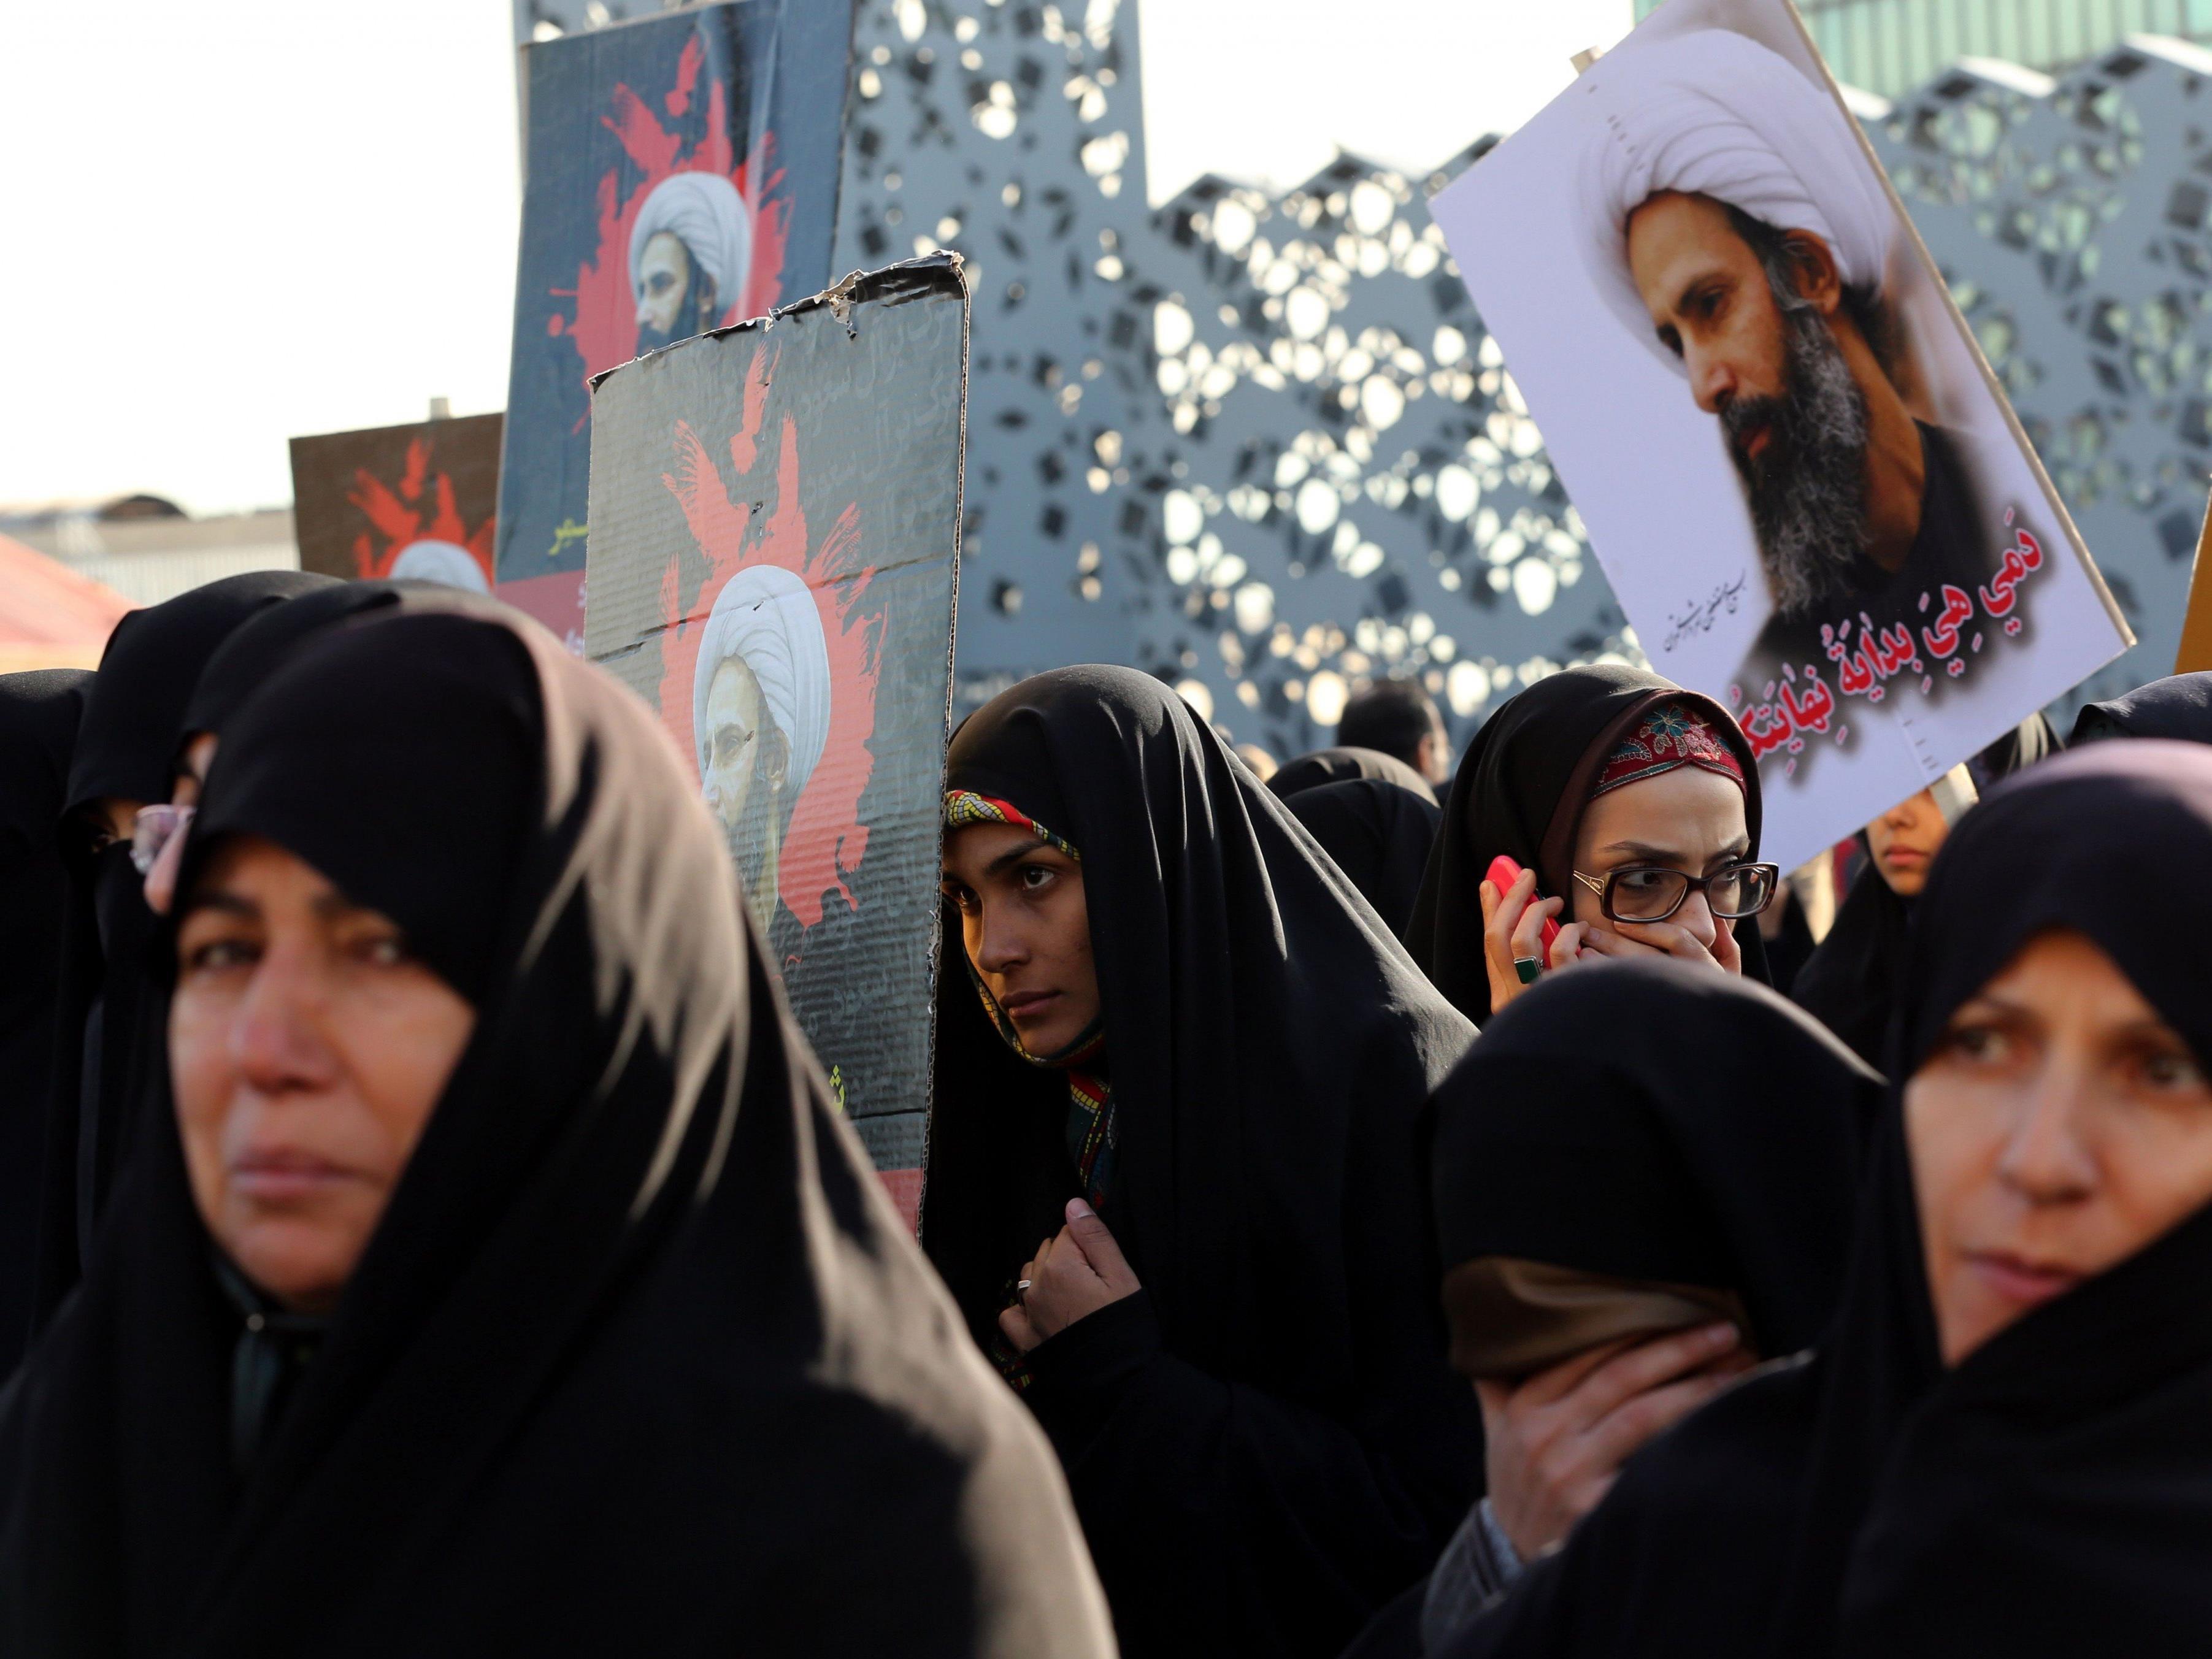 Aktueller Konflikt: Schiitischer Geistlicher Nimr al-Nimr wurde in Saudi-Arabien exekutiert.